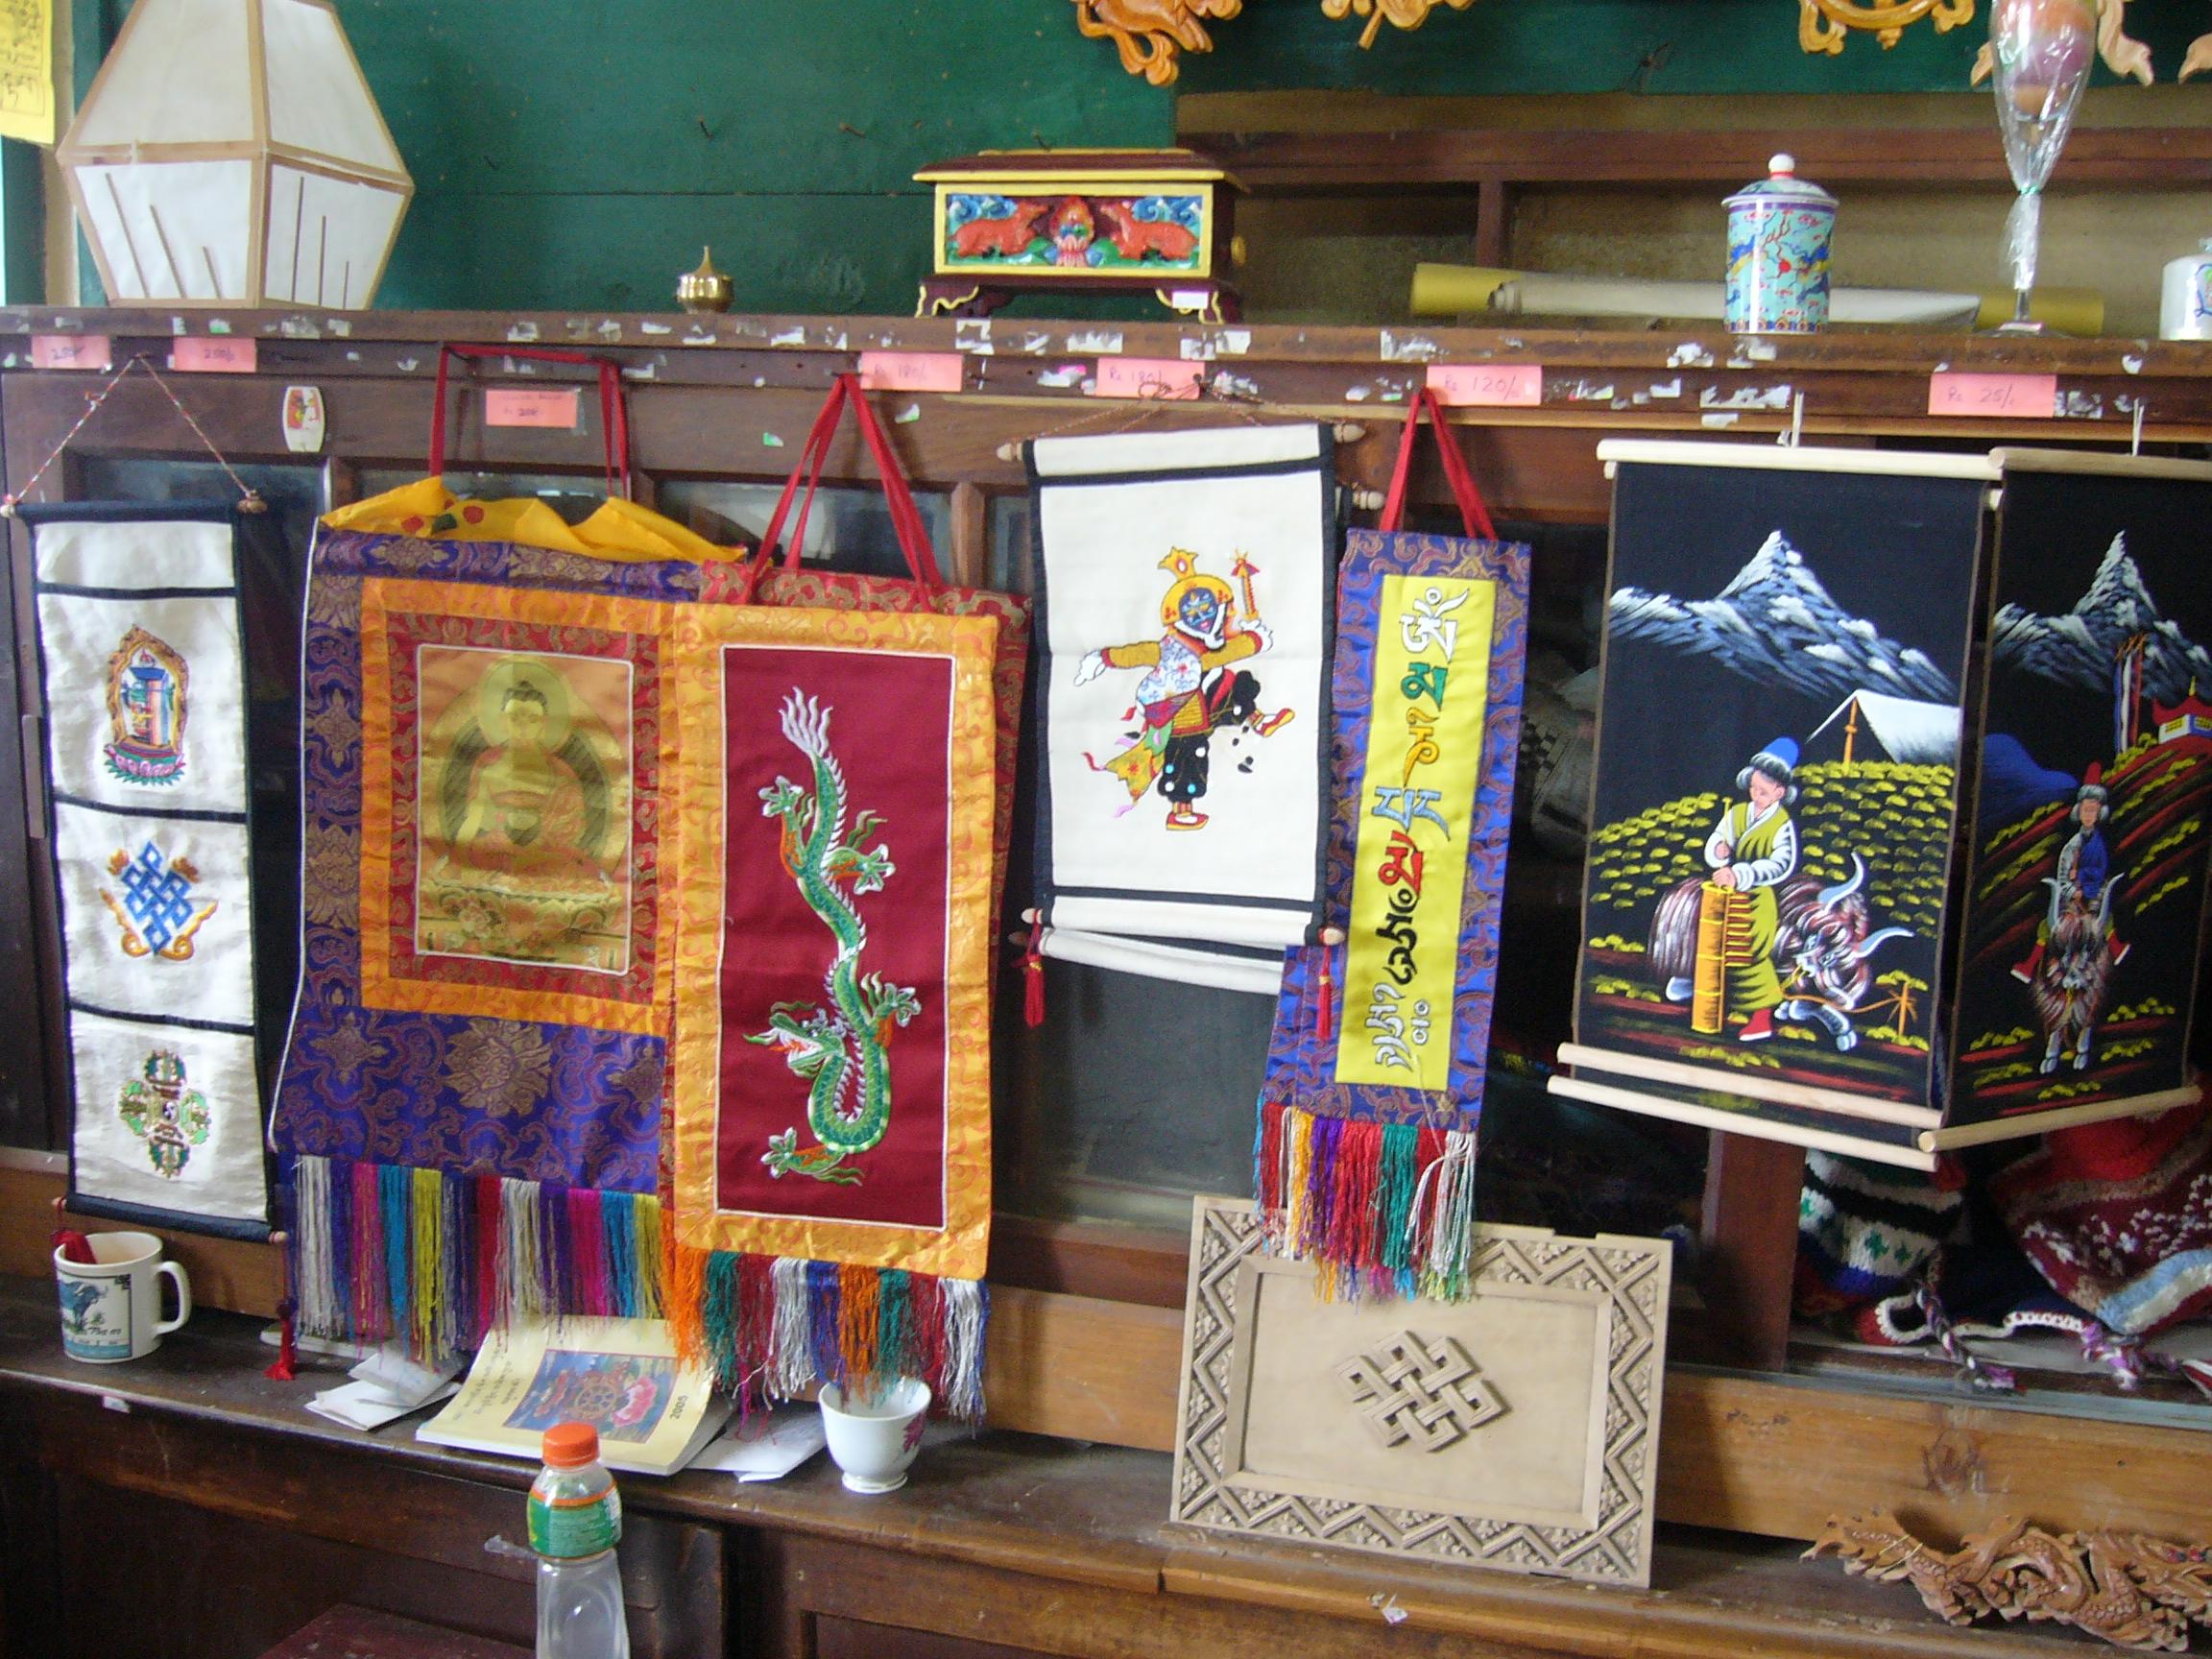 Best Shopping Destination in Darjeeling to Self-Indulge - Tibetan Refugee Self Help Center